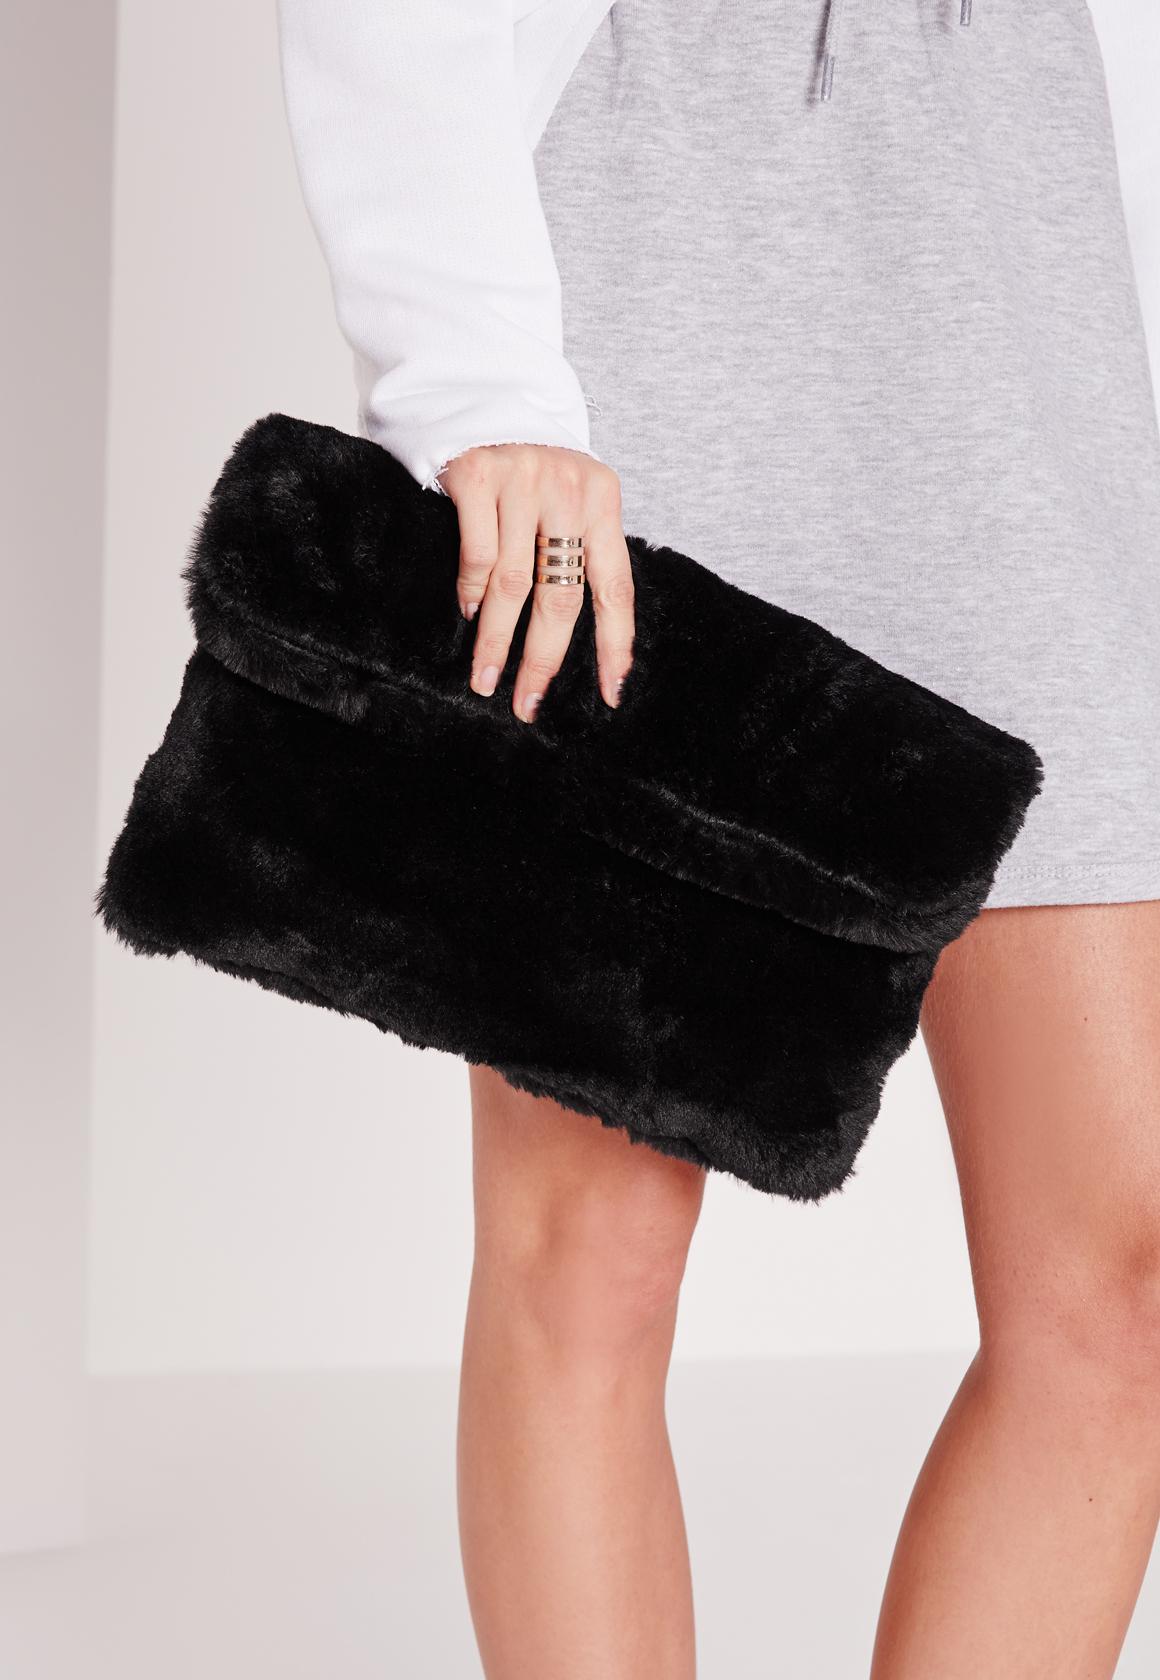 60dfac15c6 Lyst - Missguided Fold Over Fur Clutch Bag Black  in Black